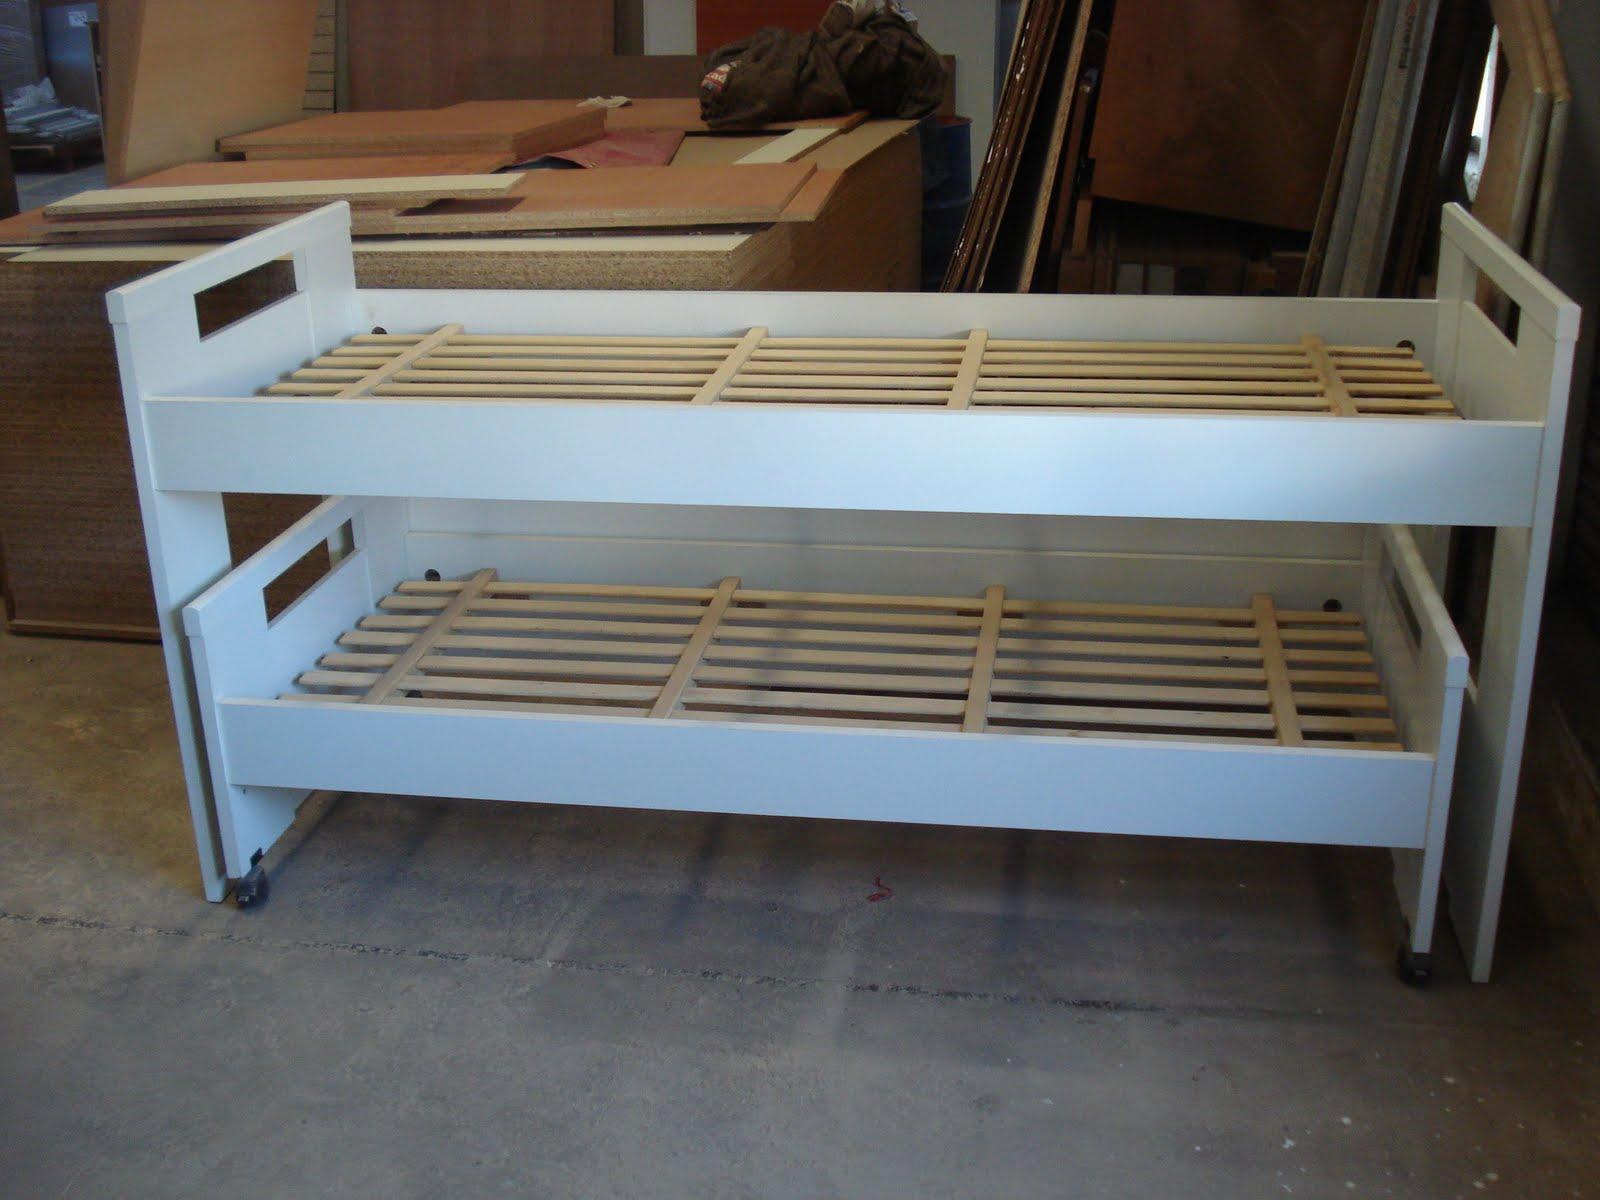 Blog cama nido en melamina blanca oferta - Cama nido para ninos ...